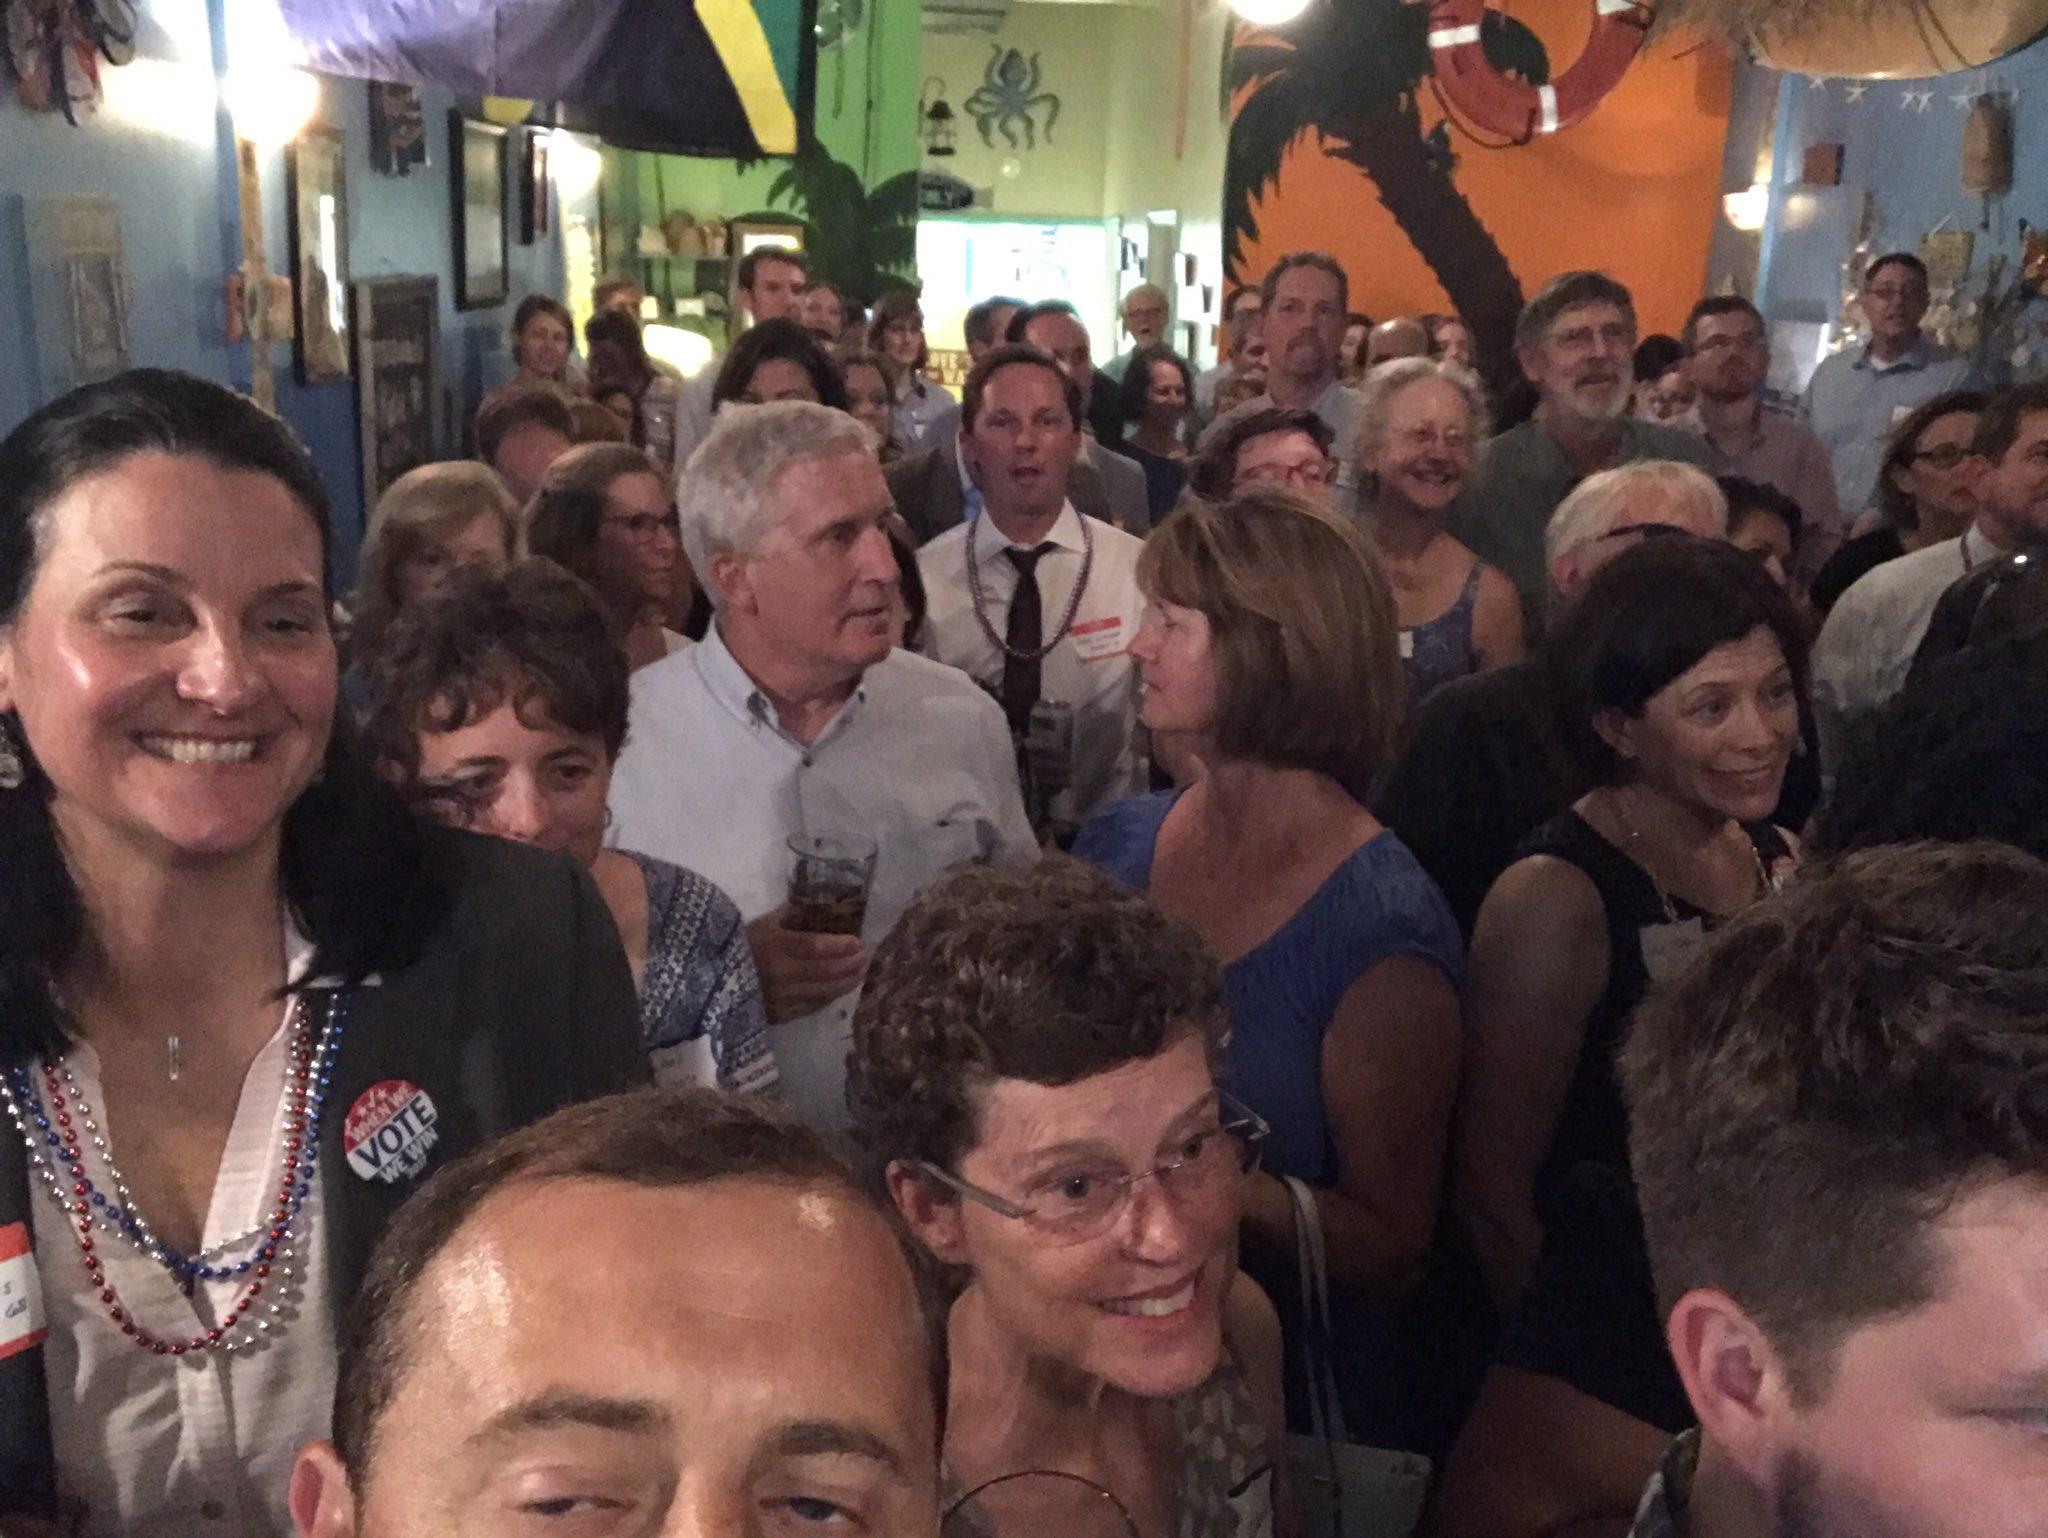 Massive crowd out to flip VA tonight! https://t.co/o7MQRPETuI https://t.co/WJuuyFxdJn